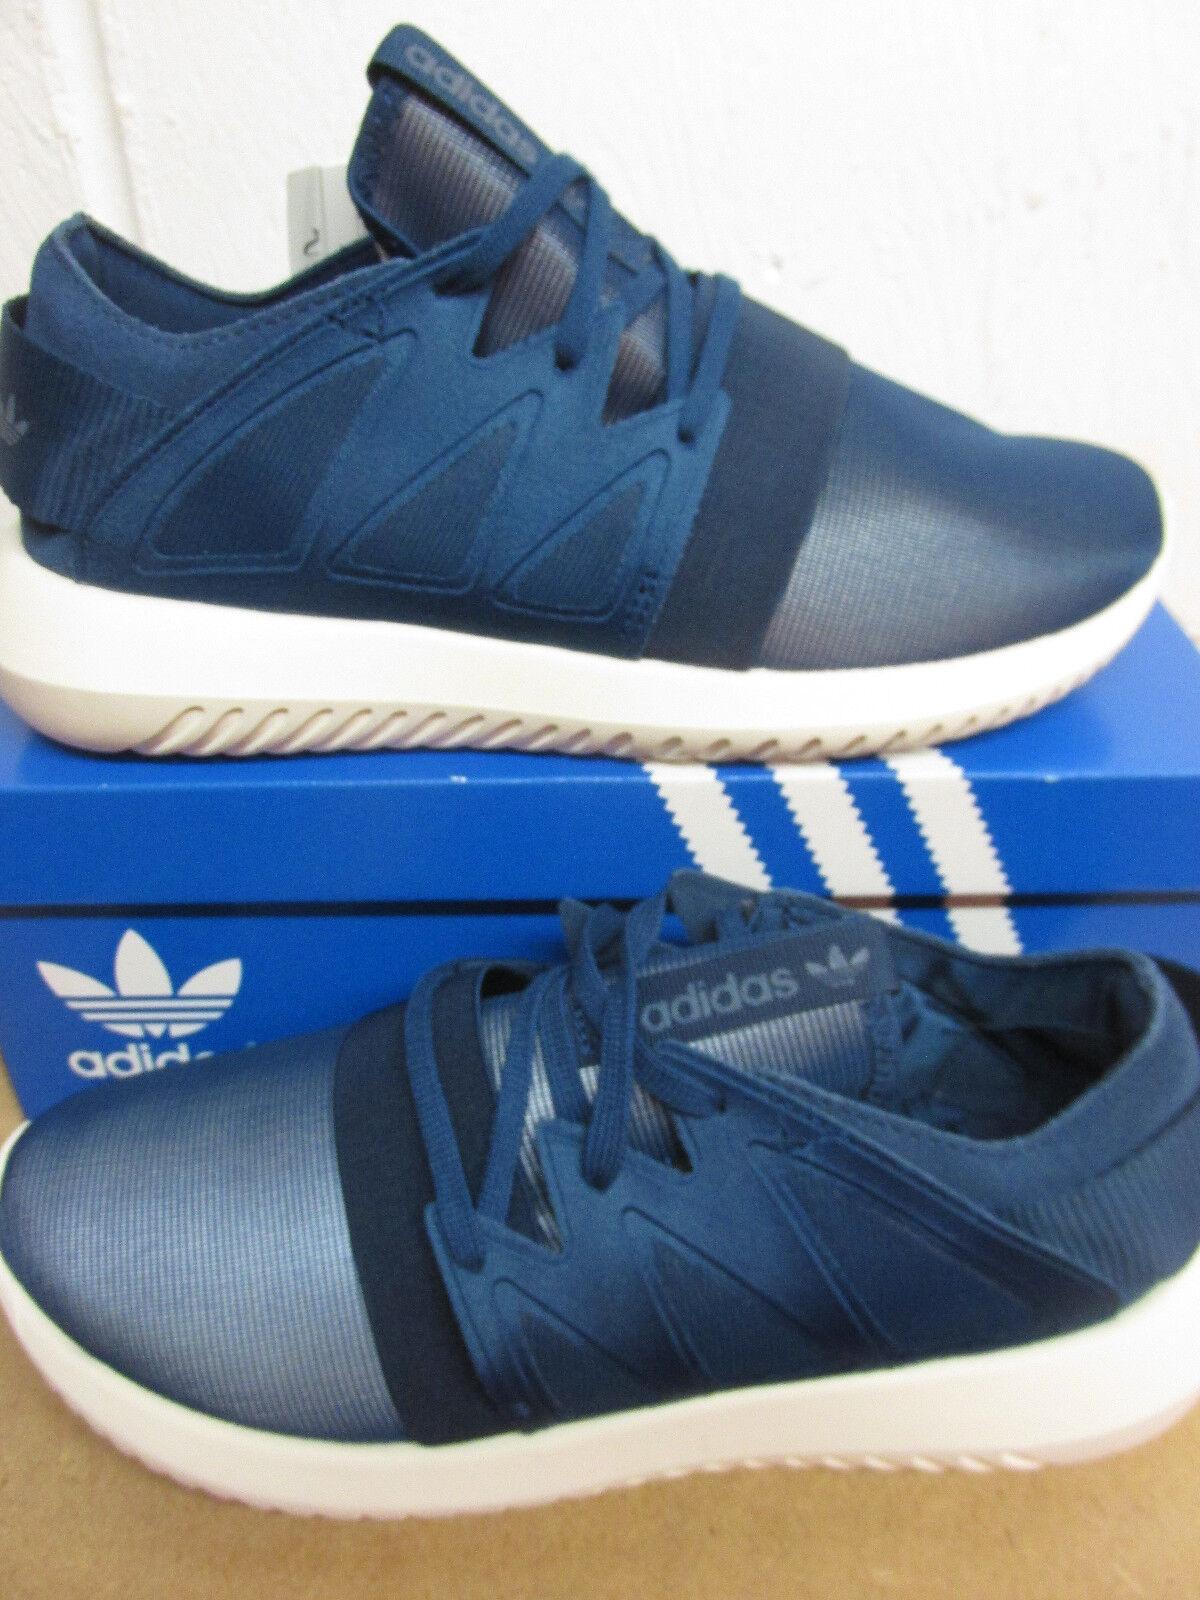 Adidas Originals Tubular Viral S75911 Womens Running Trainers Sneakers